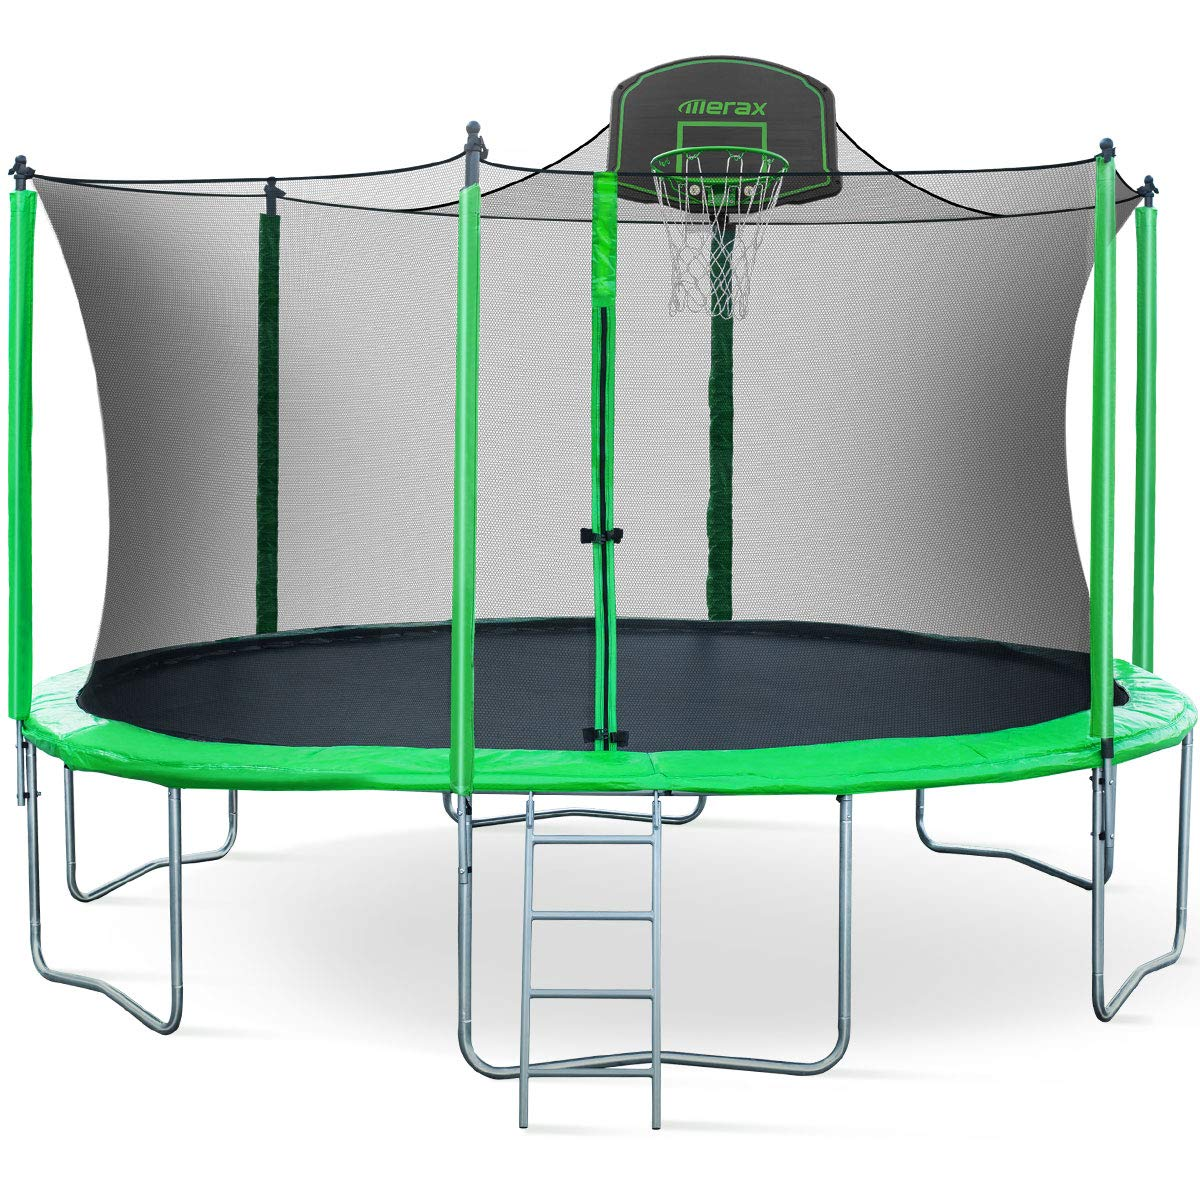 Merax 14FT 15FT Trampoline with Enclosure Kids Trampoline ...